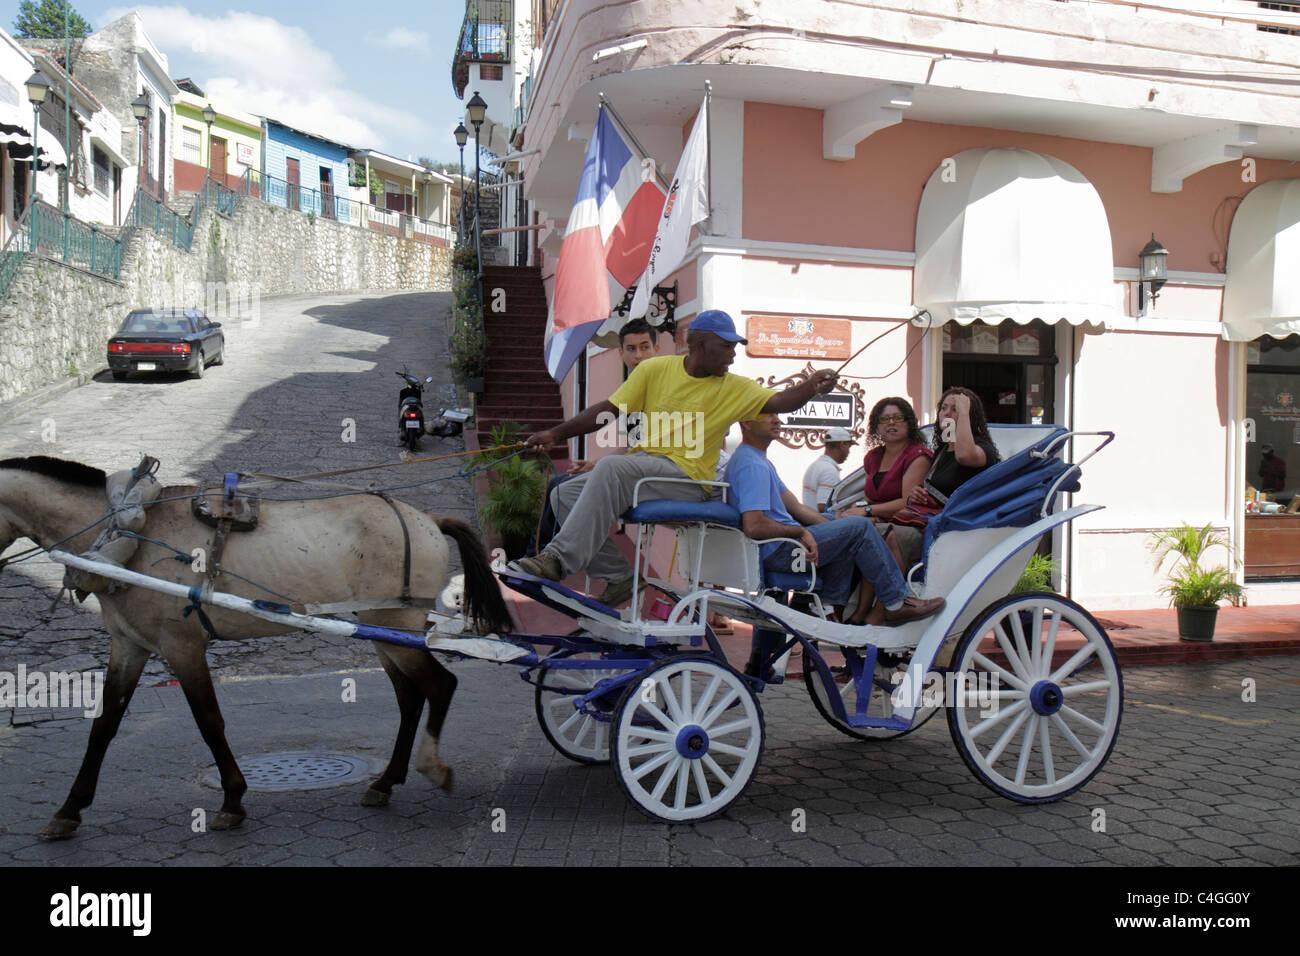 Santo Domingo Dominican Republic Ciudad Colonia Calle Hostos street scene horse carriage ride Black Hispanic man Stock Photo